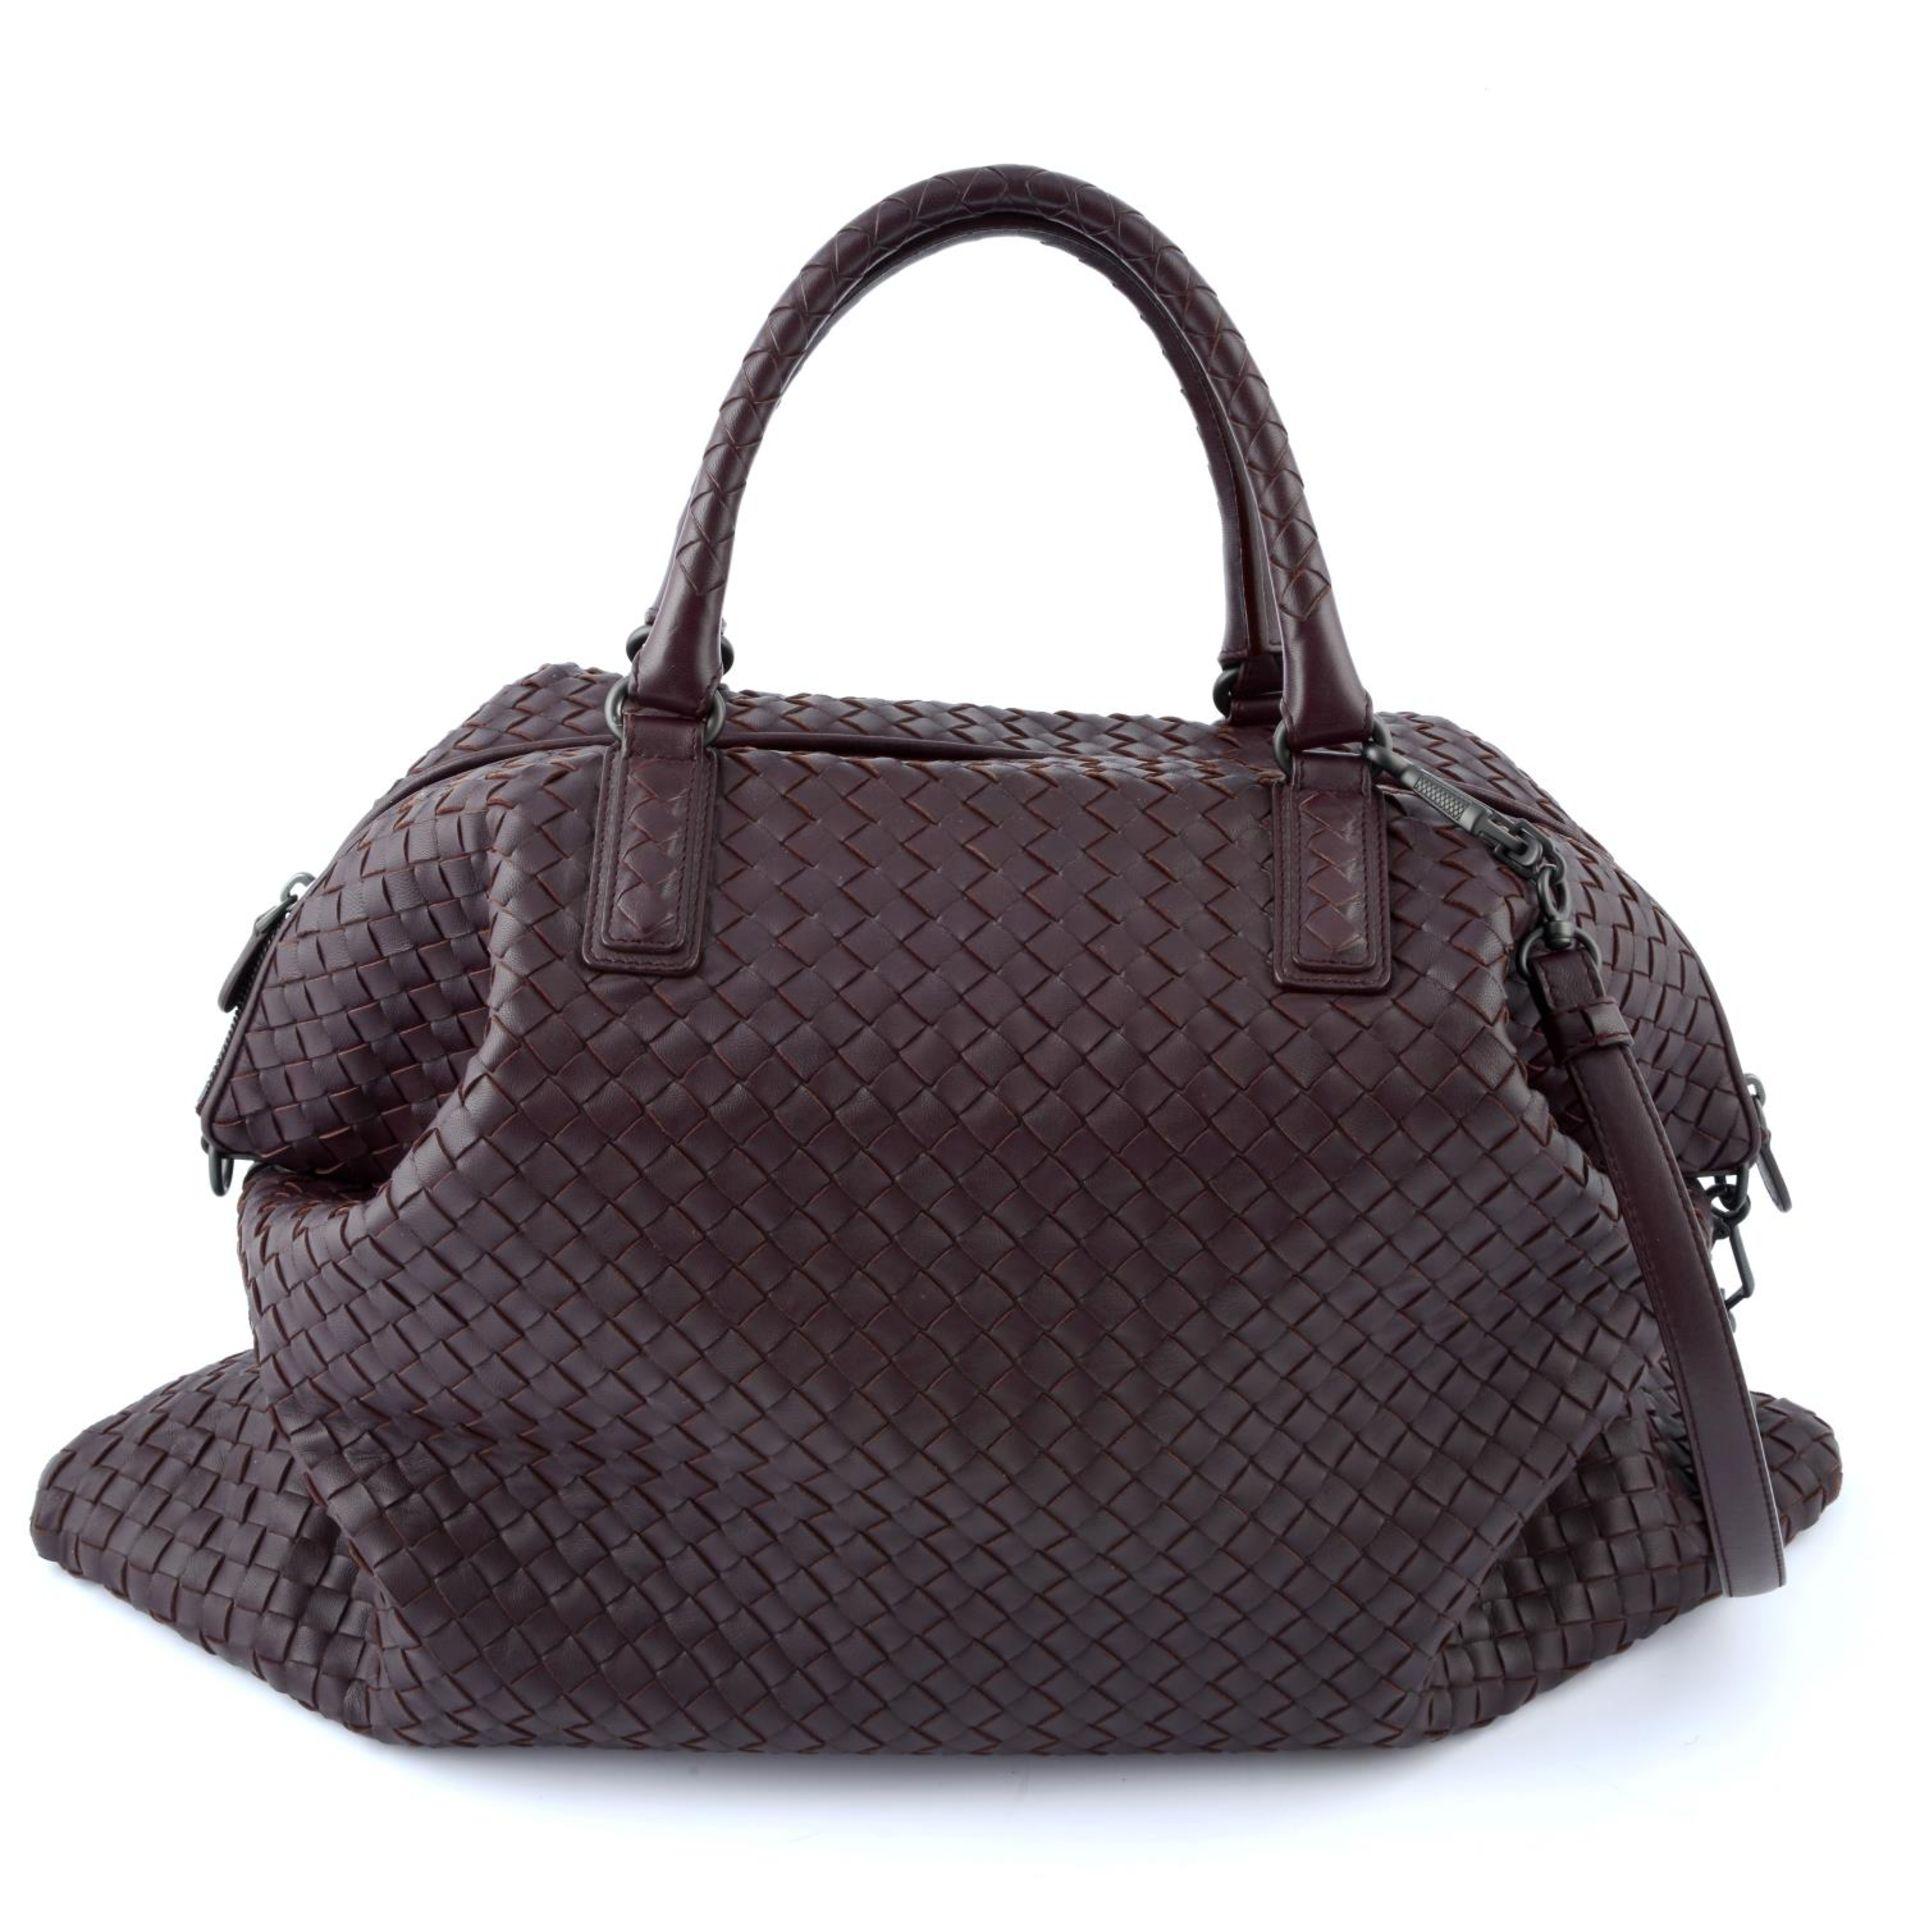 BOTTEGA VENETA - an XL fold over Nappa Intrecciato handbag. - Image 2 of 5